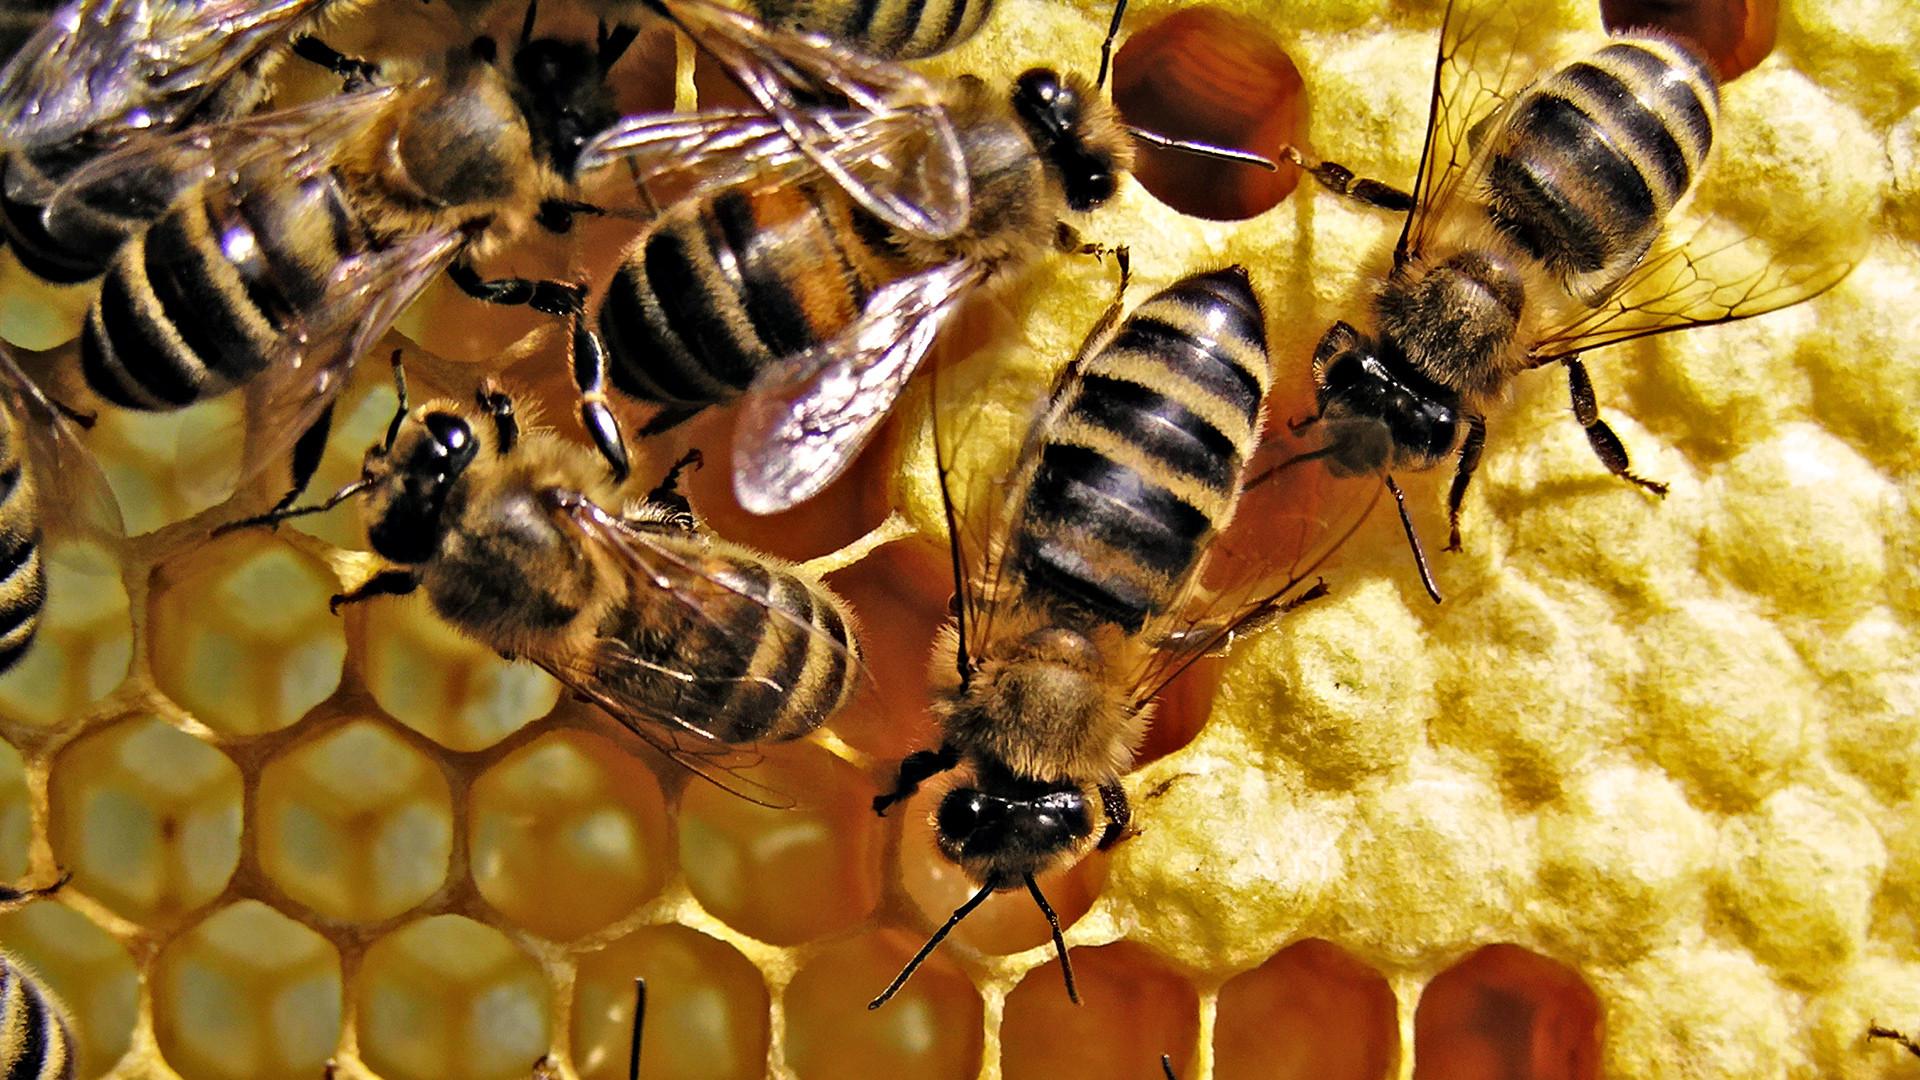 Bees animal bee close up honey honeycomb yellow 1920x1080